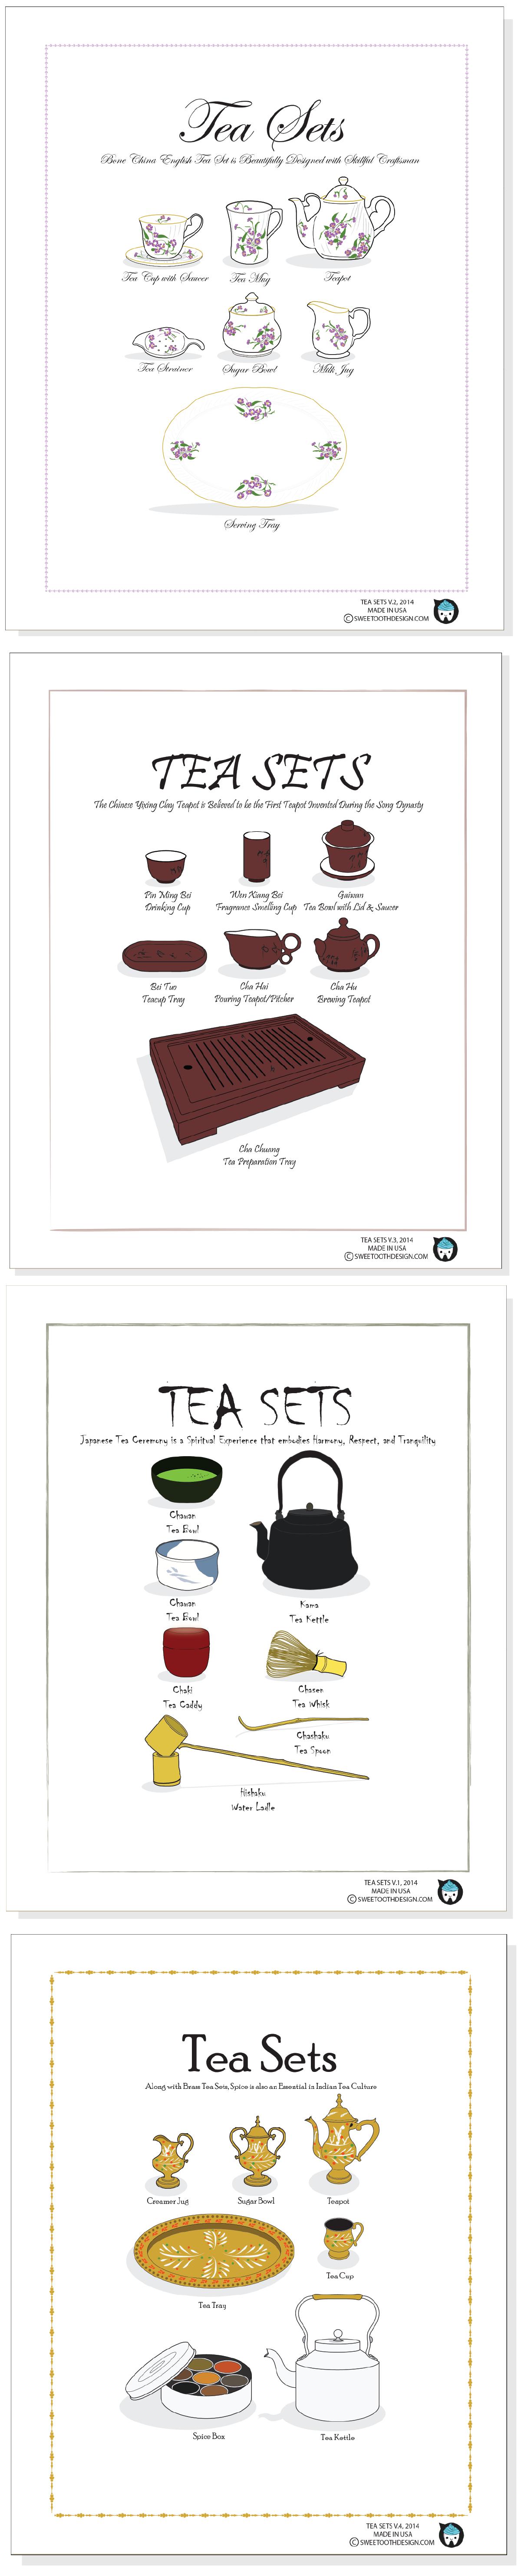 TEA SETS: English, Chinese, Japanese, and Indian Tea Sets #teasets